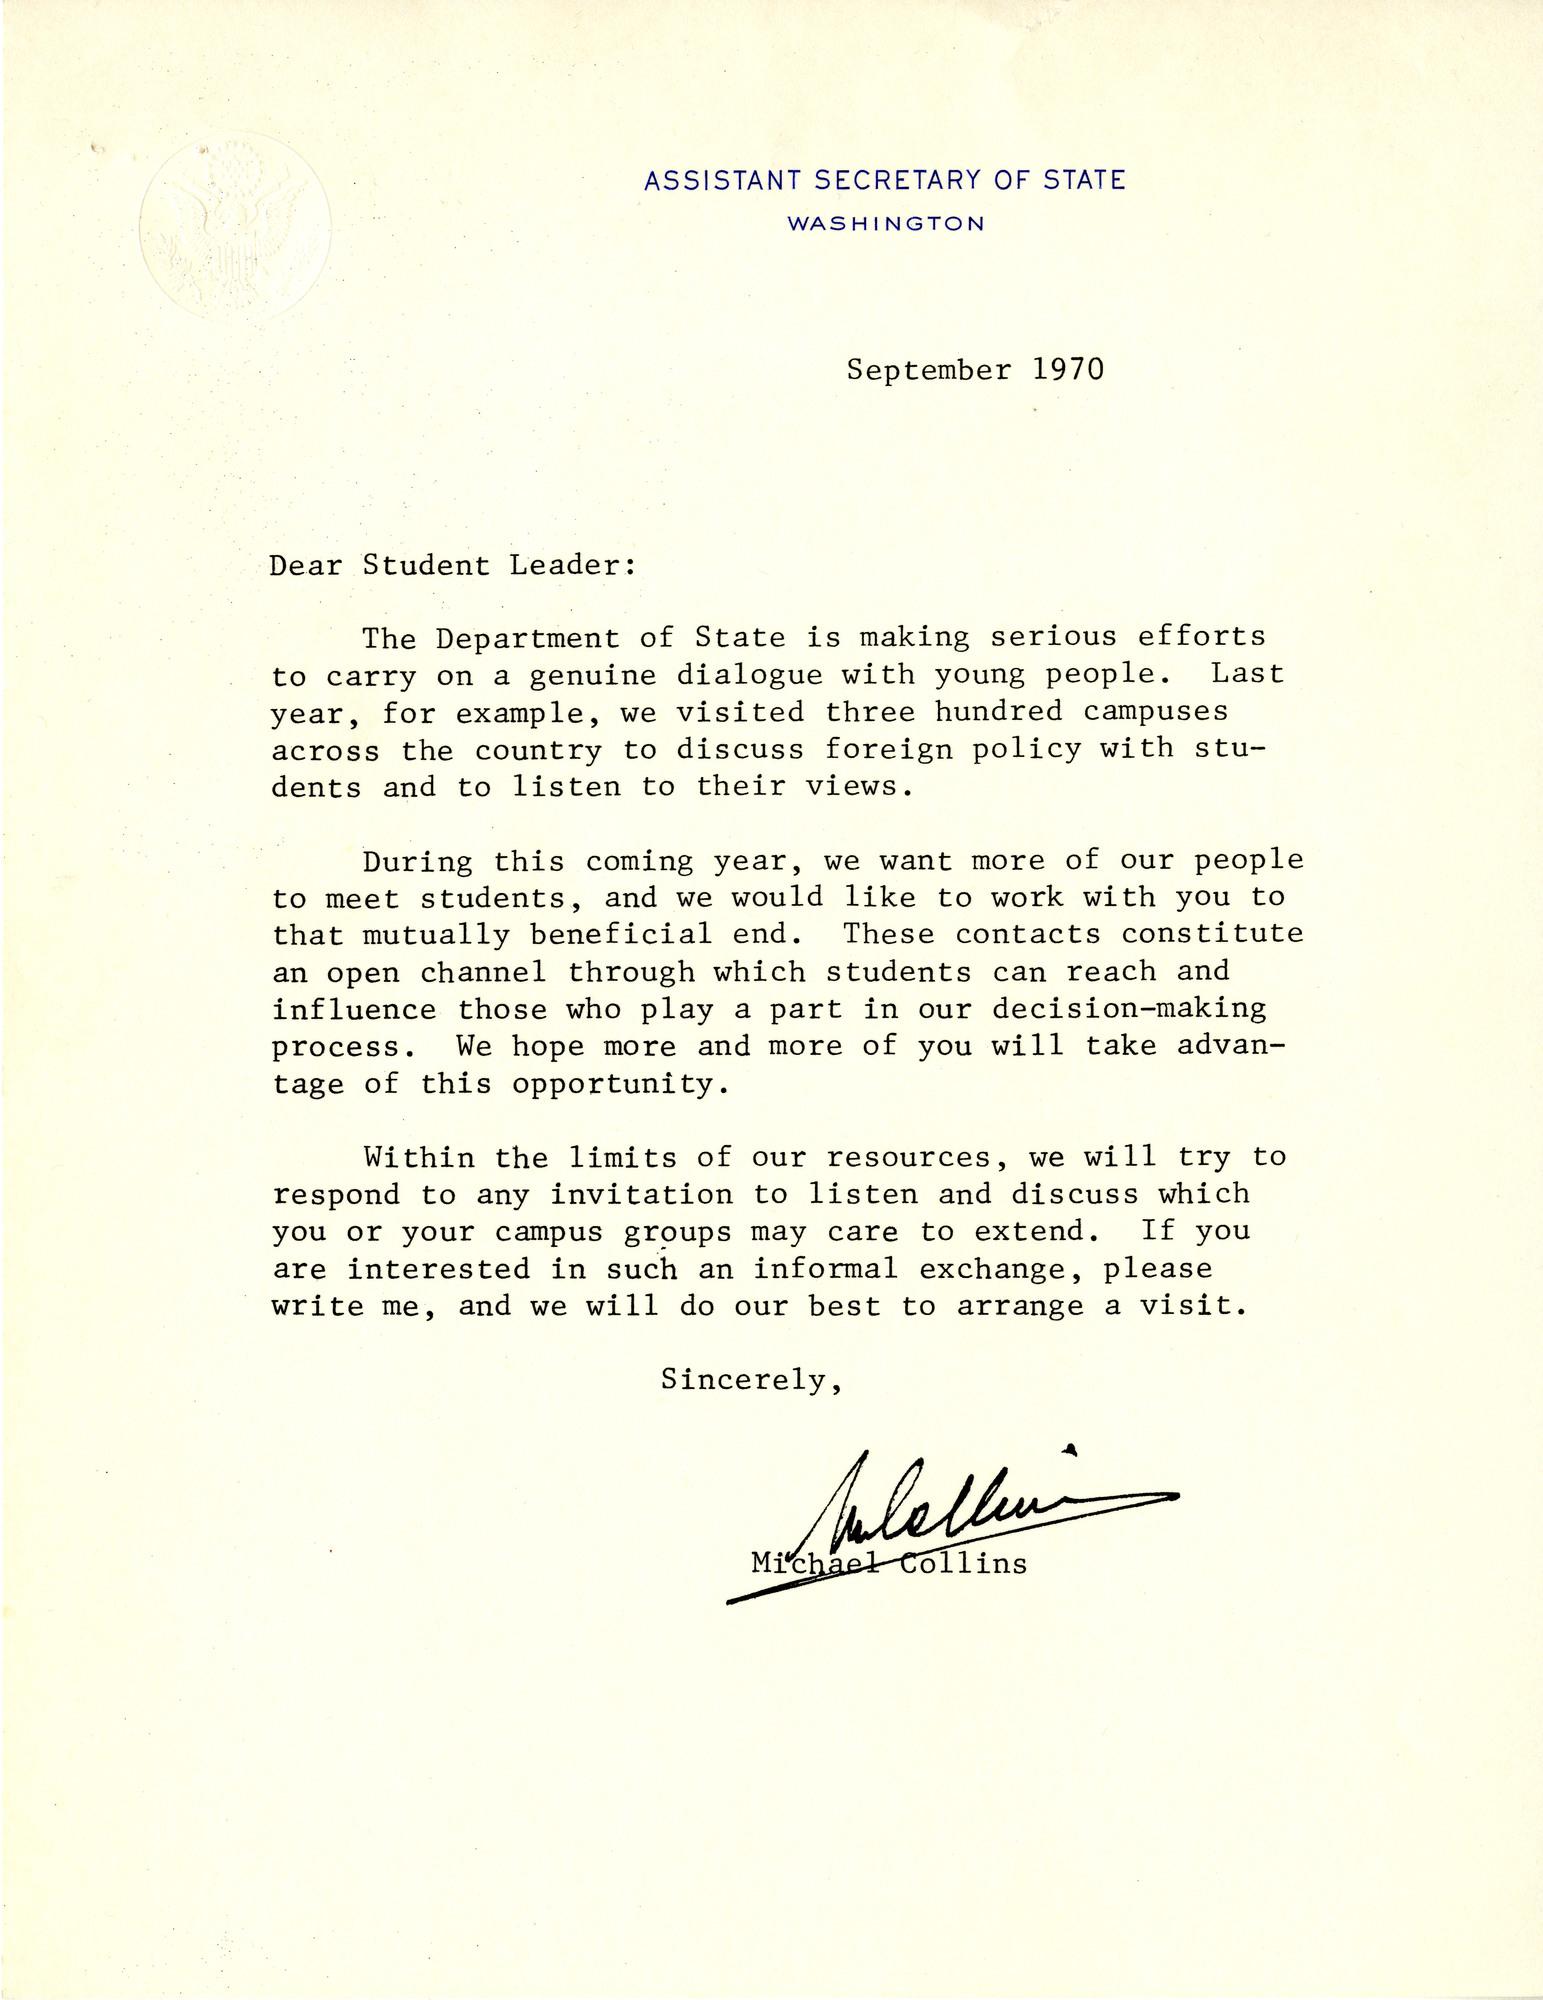 http://spec.lib.vt.edu/pickup/Omeka_upload/Ms1989-029_B18_F1_MichaelCollins_Letter_1970_0900_1.jpg